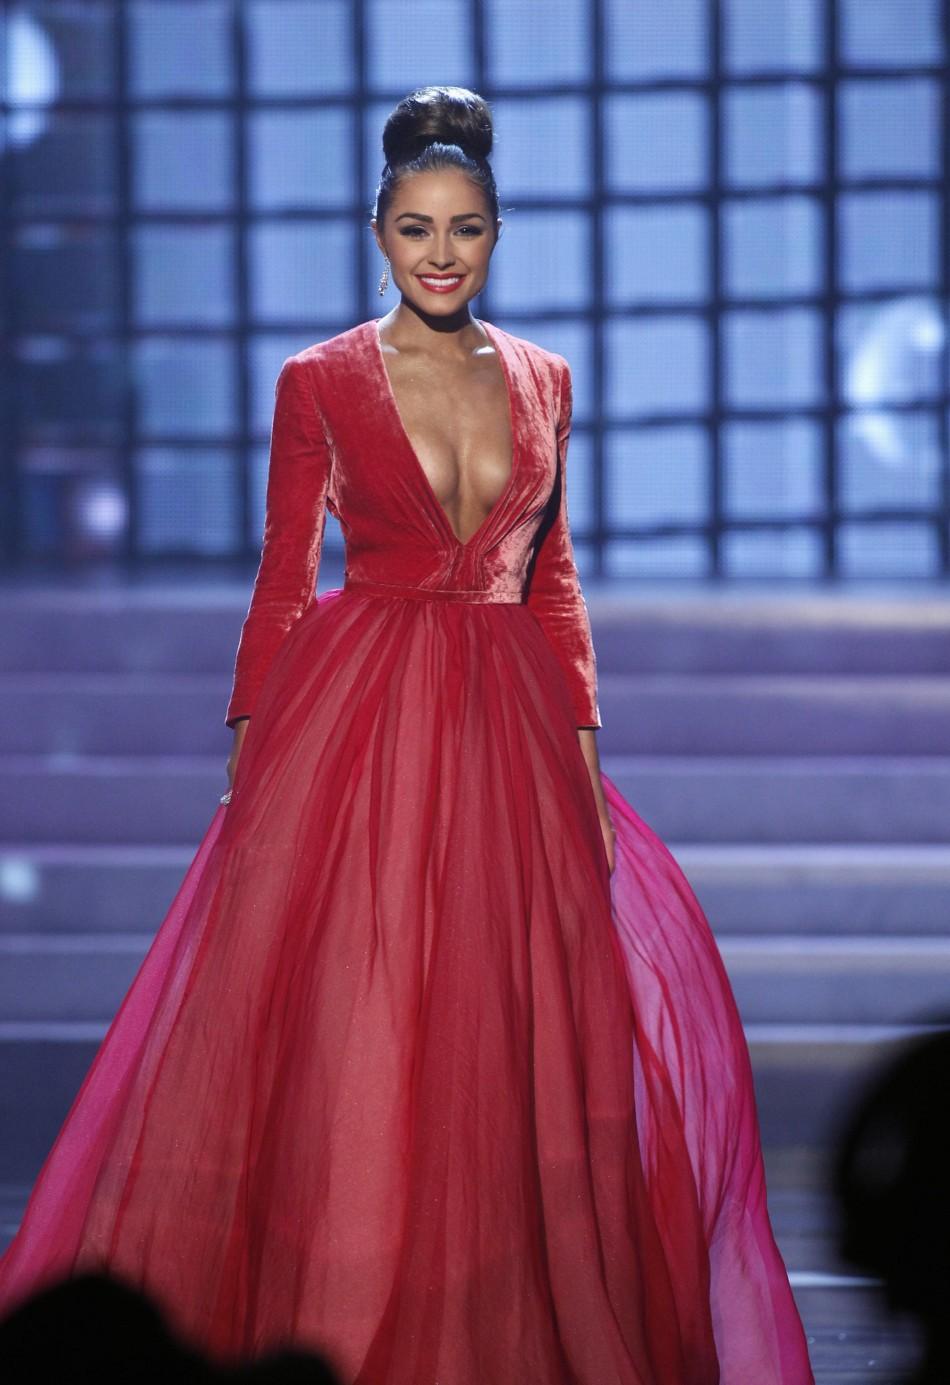 Miss usa universe 2018 dress color